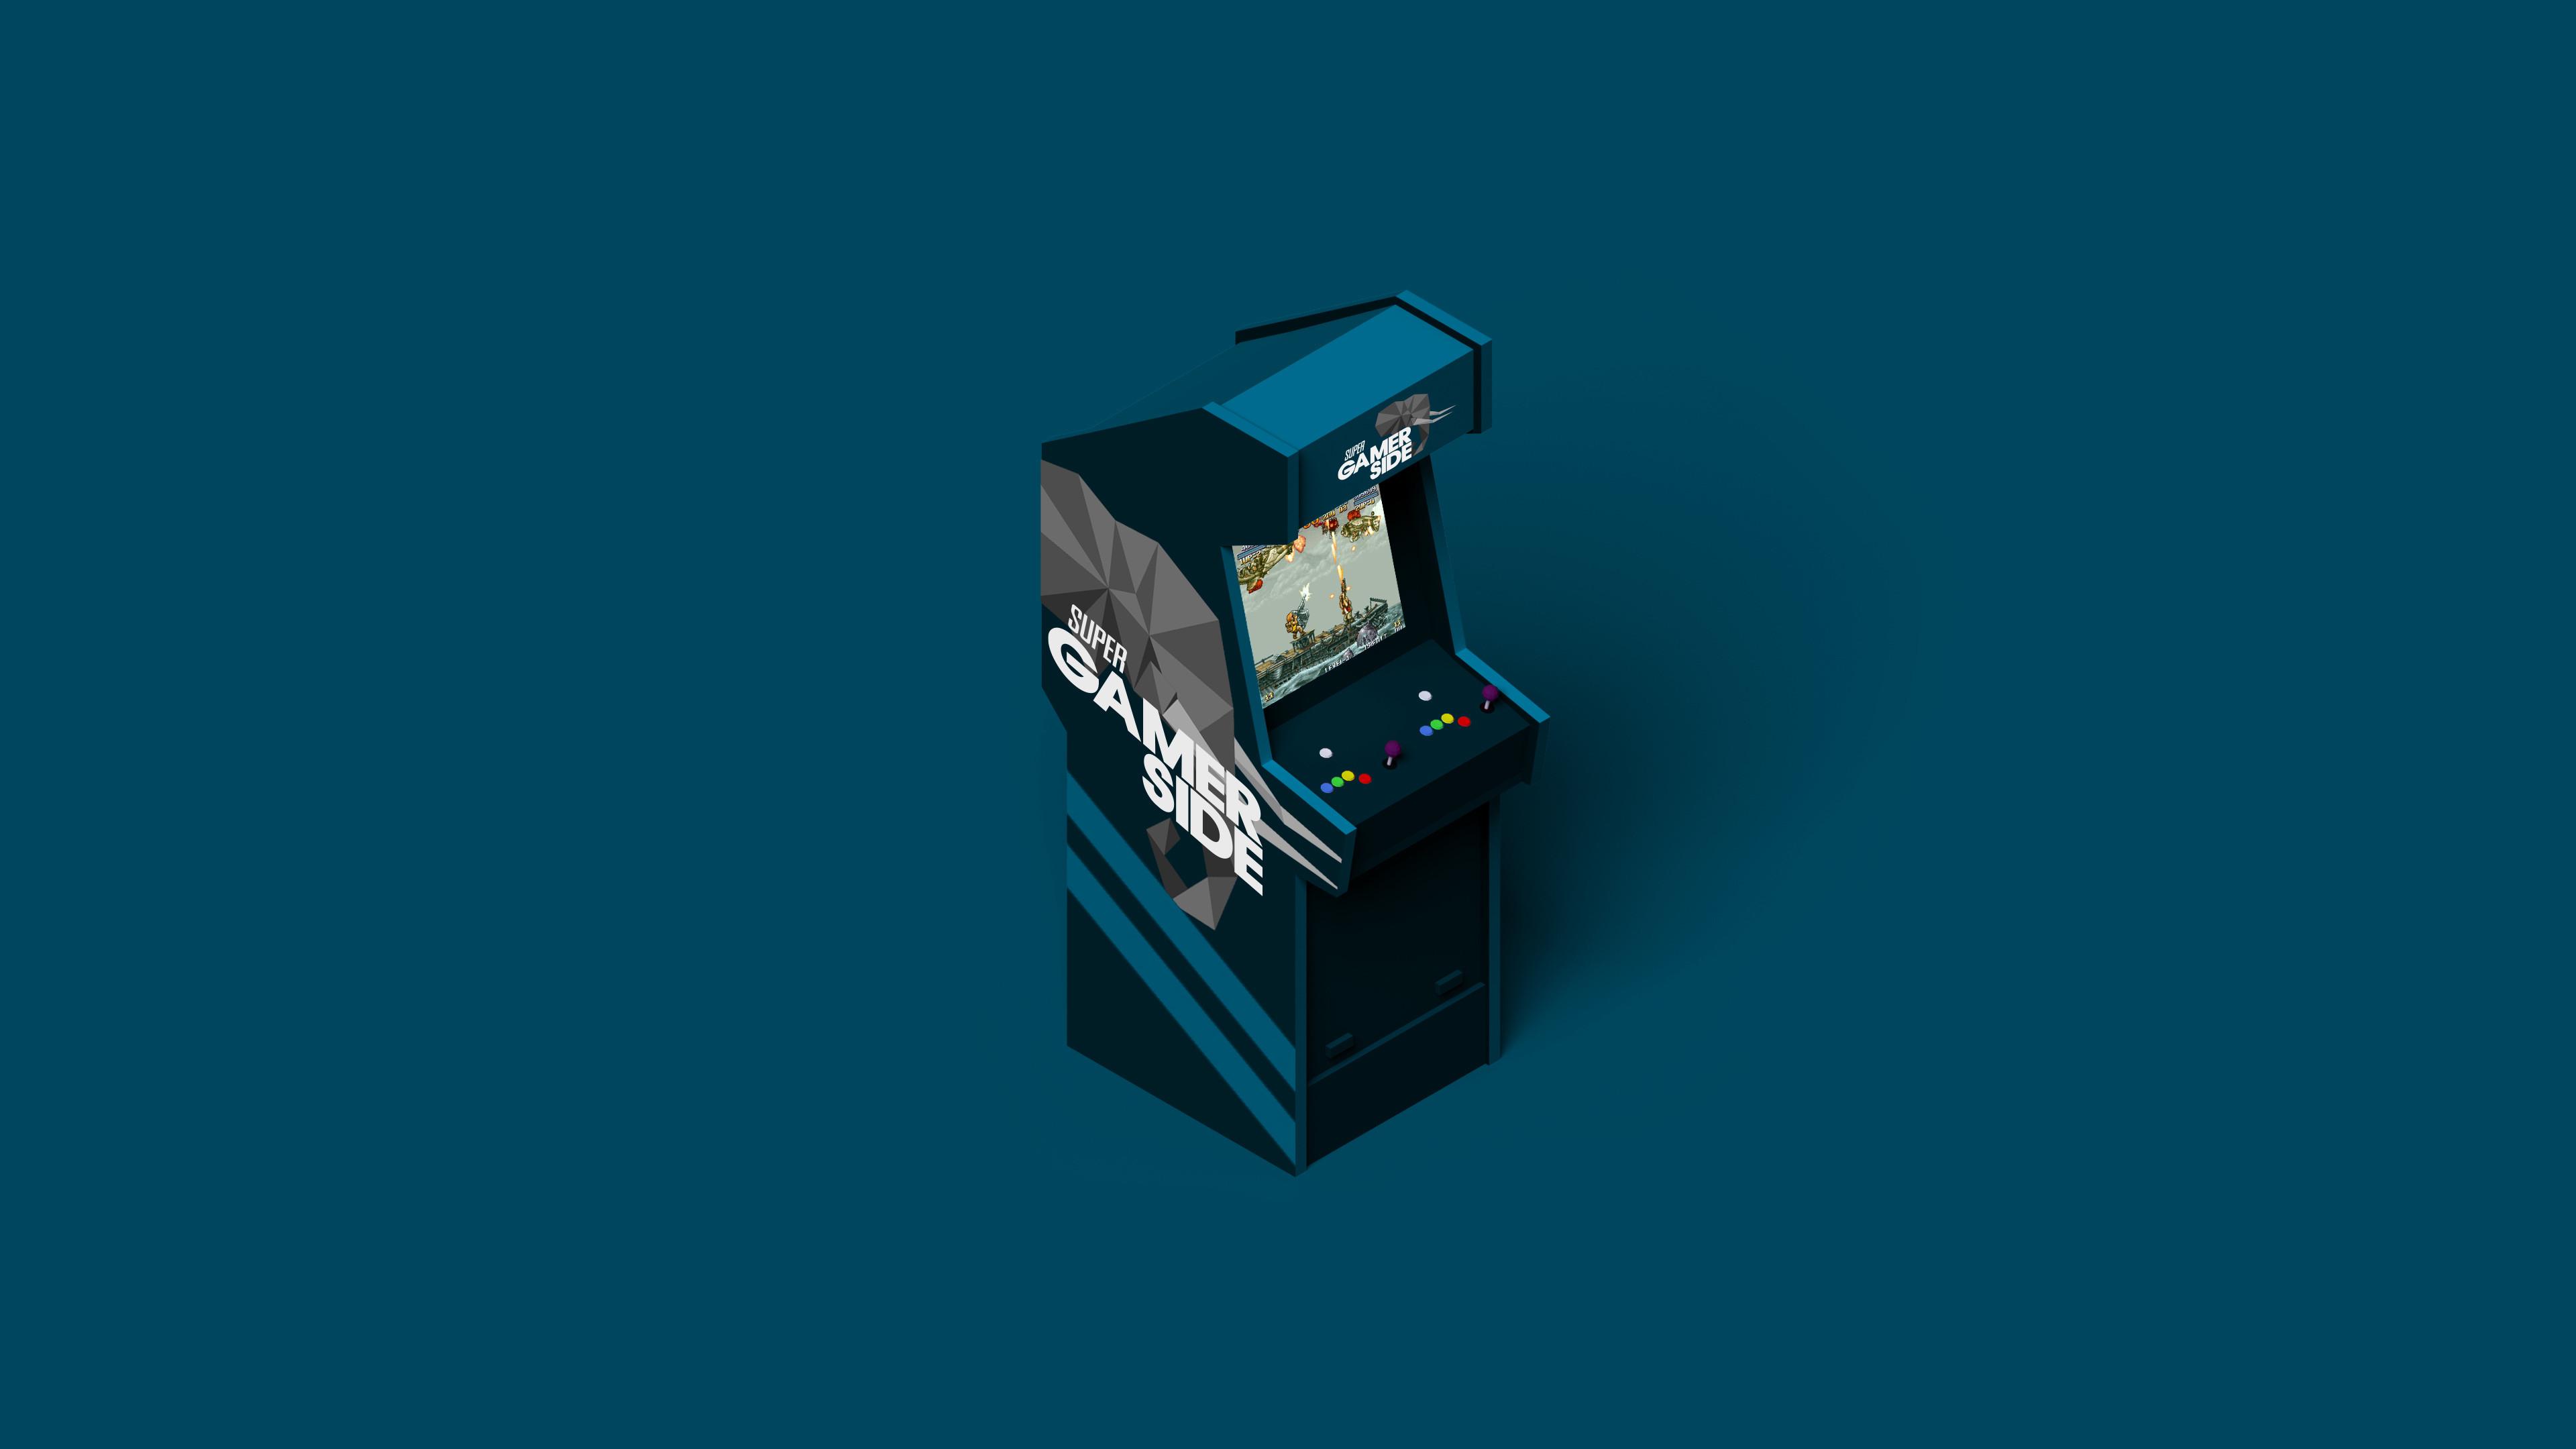 gamerside arcade gaming minimalist 4k ui 3840x2160 1 - Arcade Gaming Minimalist - Arcade Gaming Minimalist 4k wallpaper